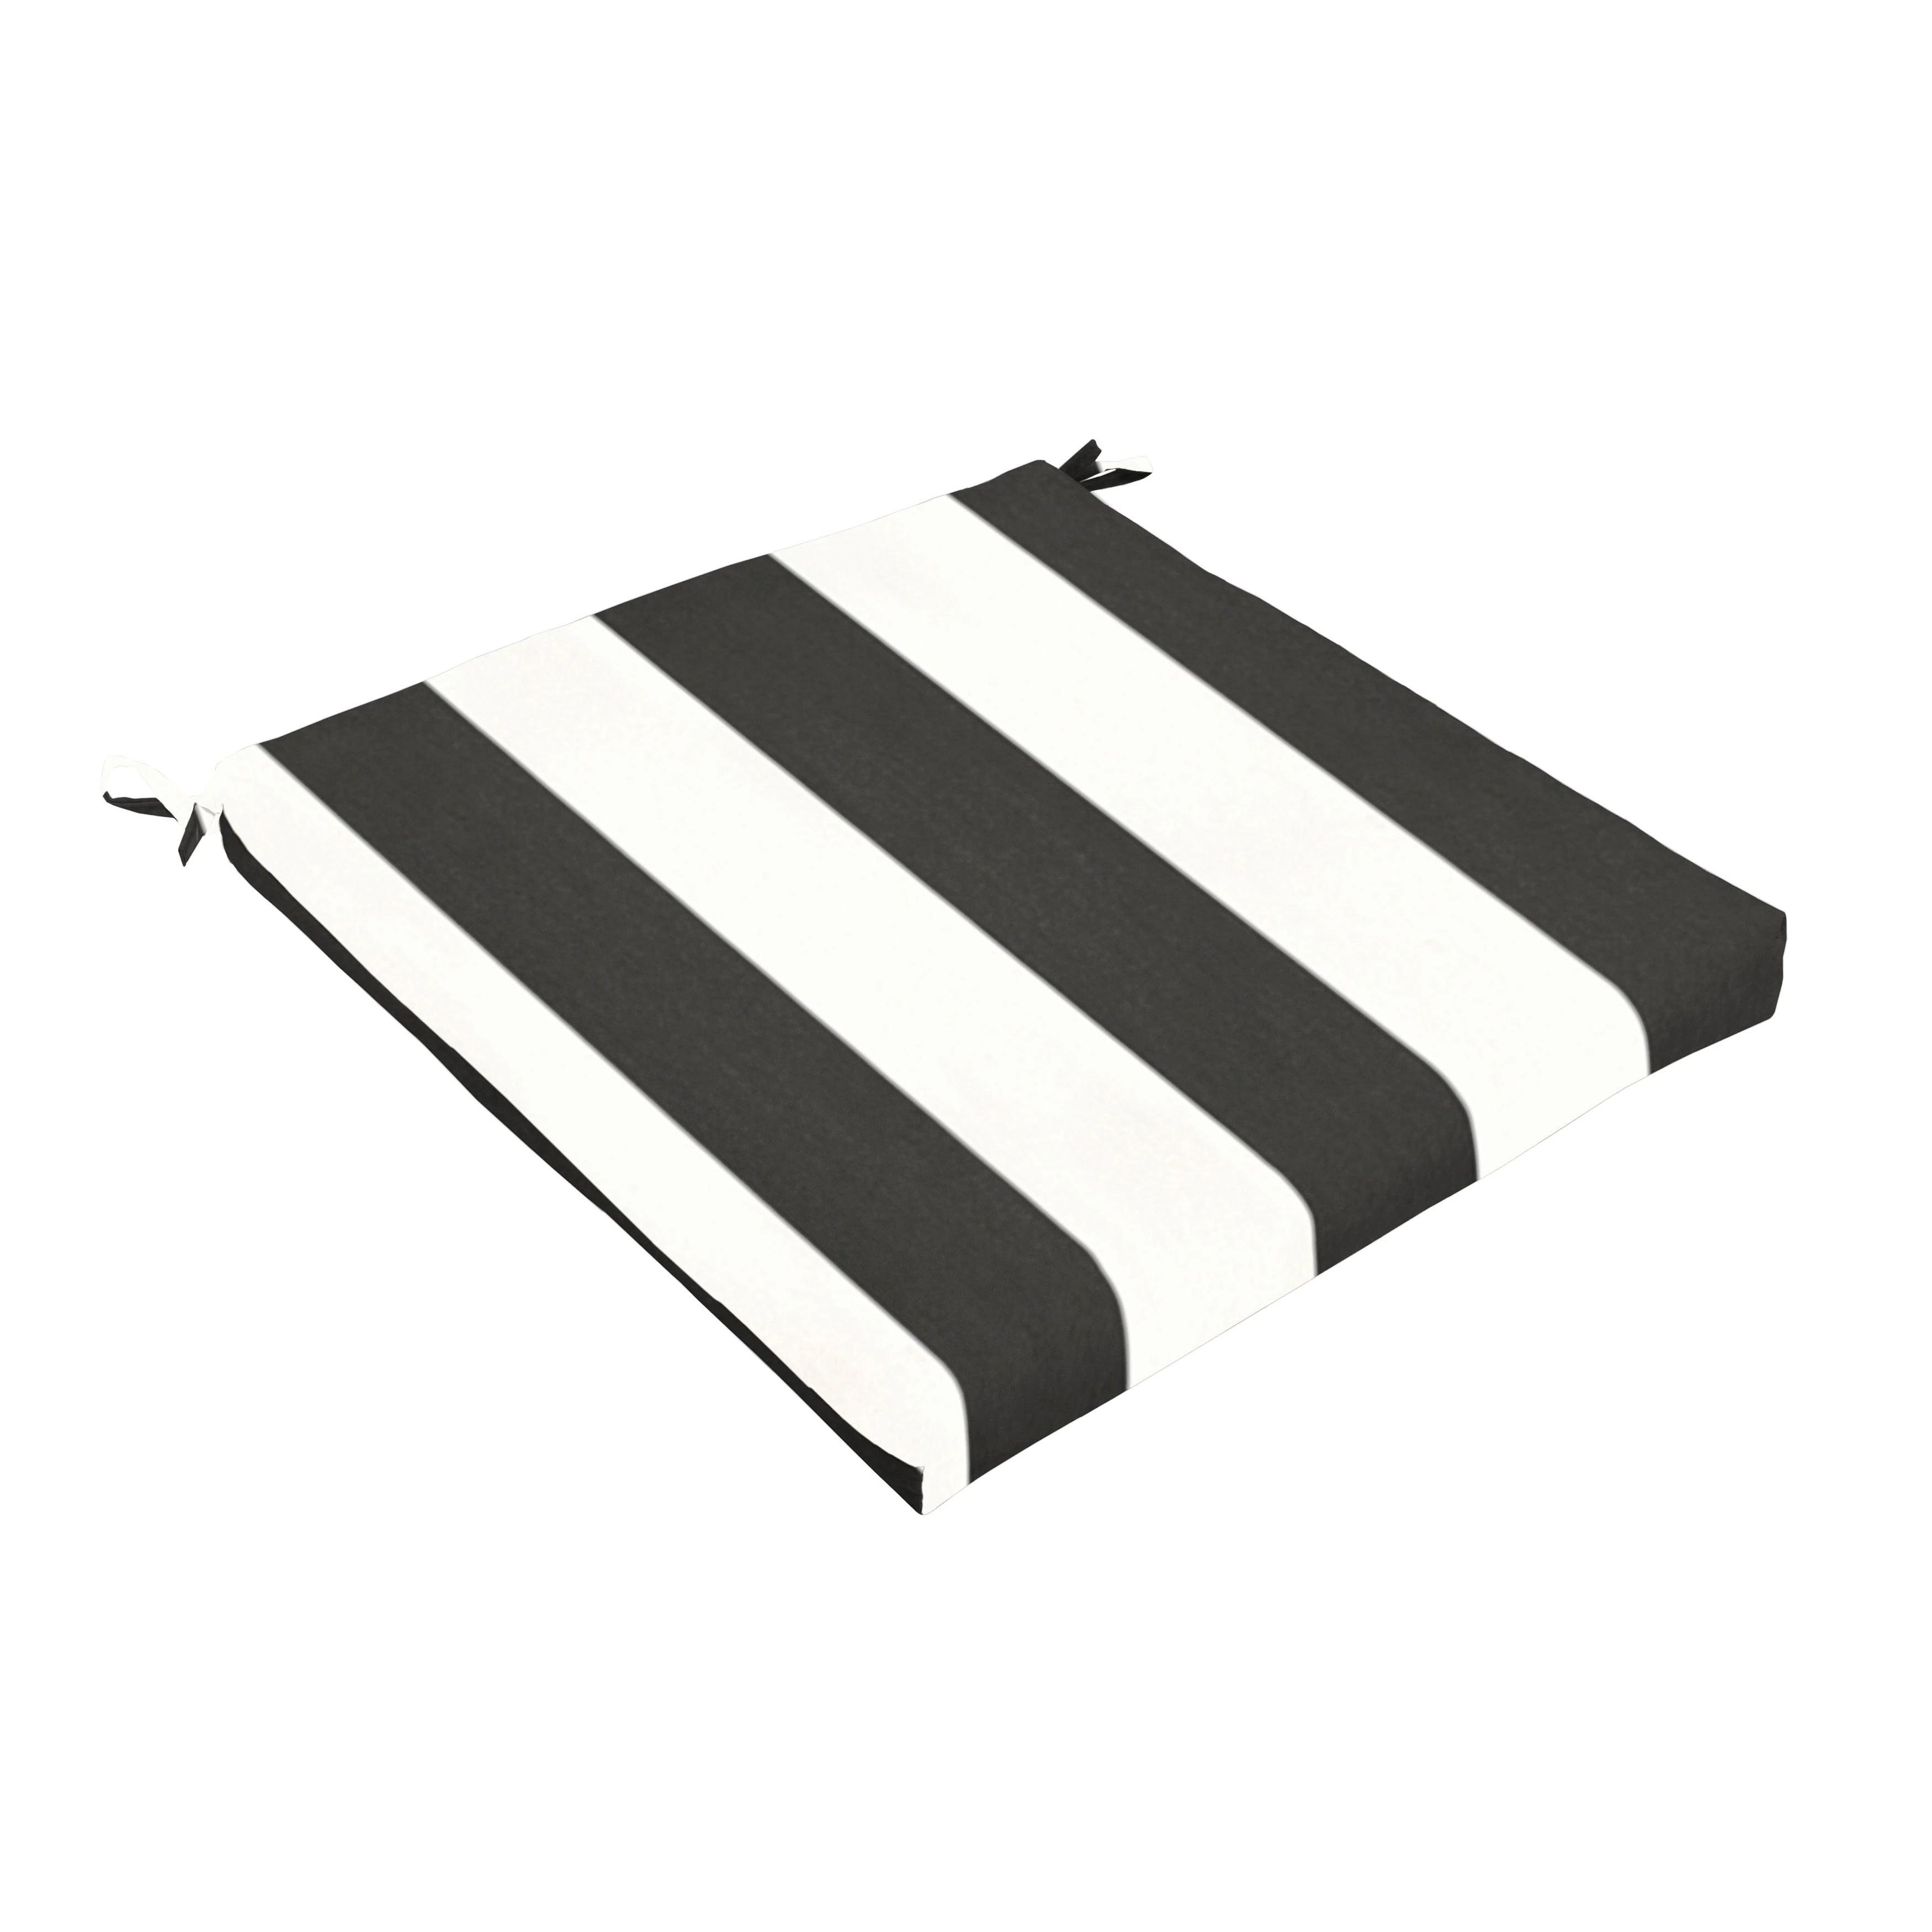 sunbrella black white stripe indoor outdoor chair cushion 20 in w x 20 in d